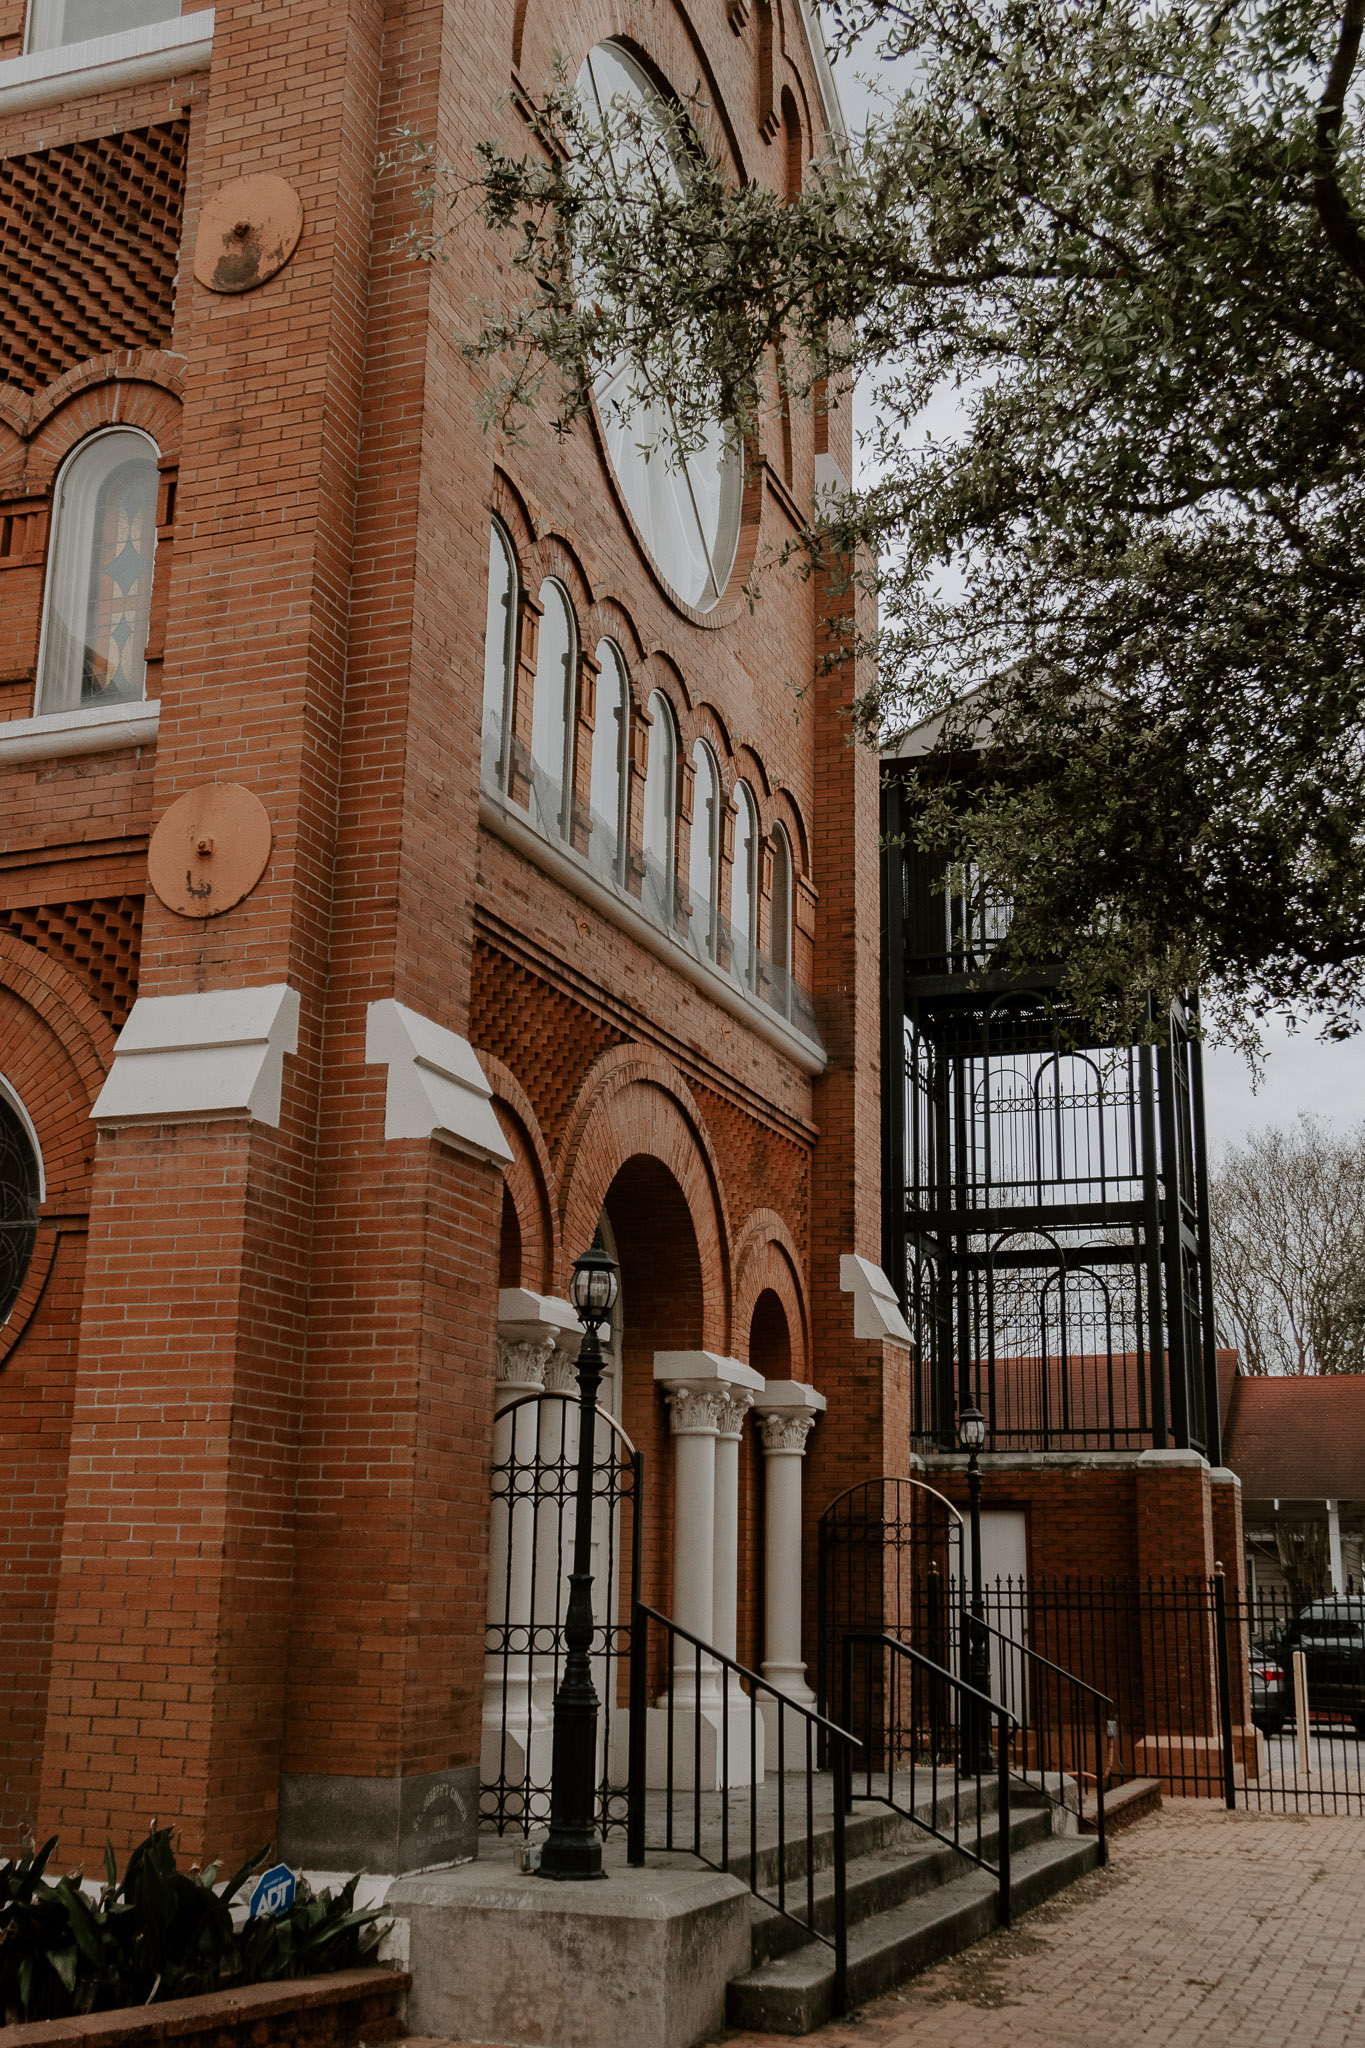 Catholic Houston Texas Flare Wedding Bell Tower-1282.jpg